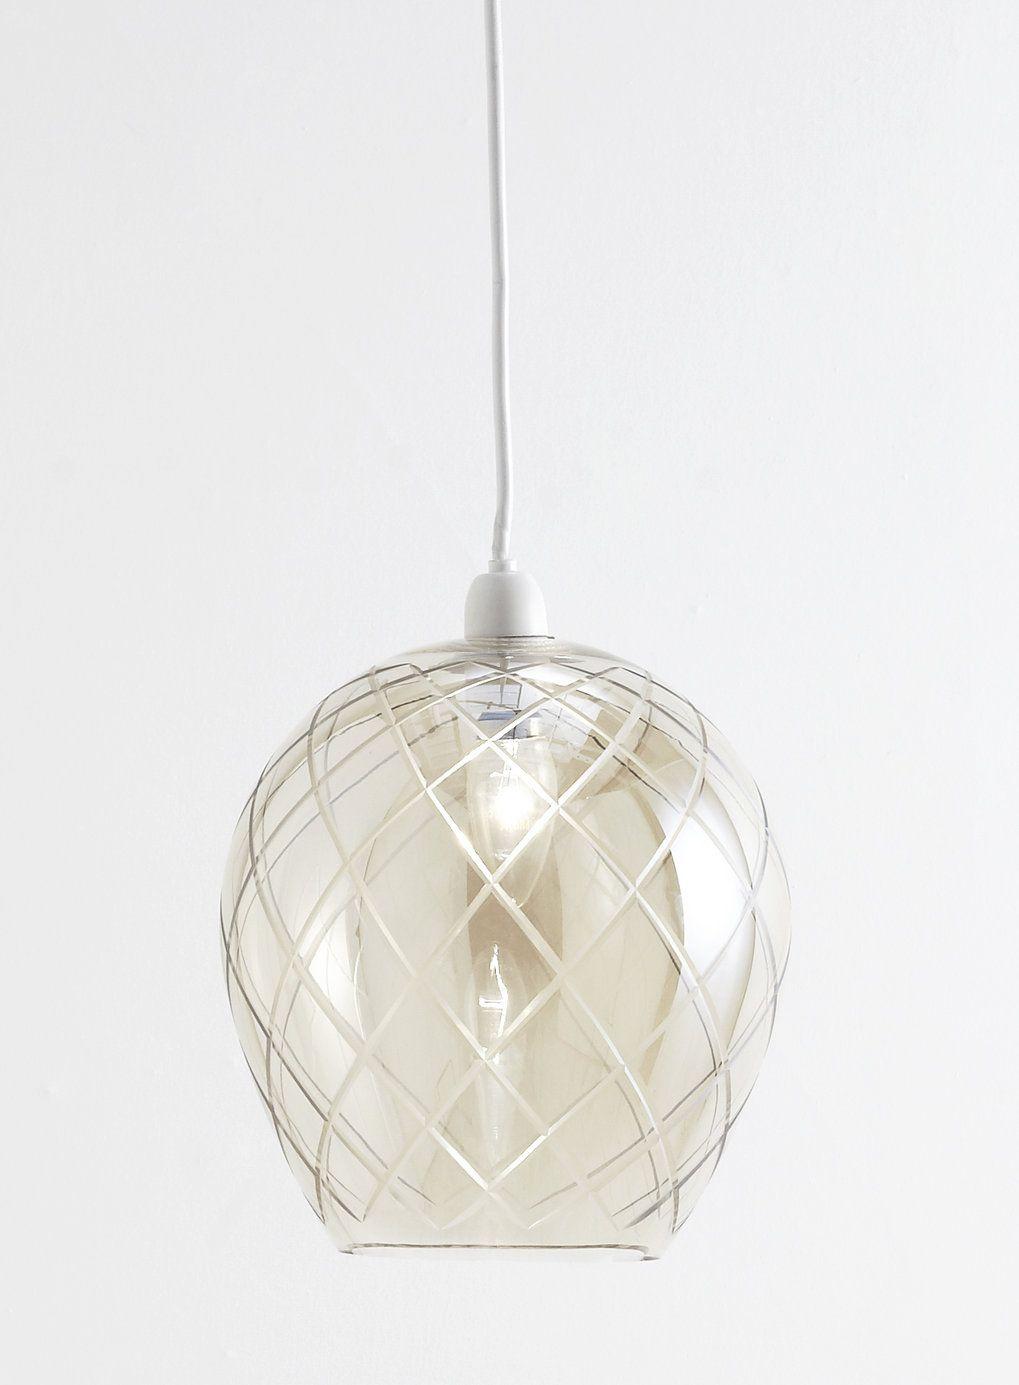 Aida Easyfit Ceiling Light - ceiling lights - Lighting Event - Home ...